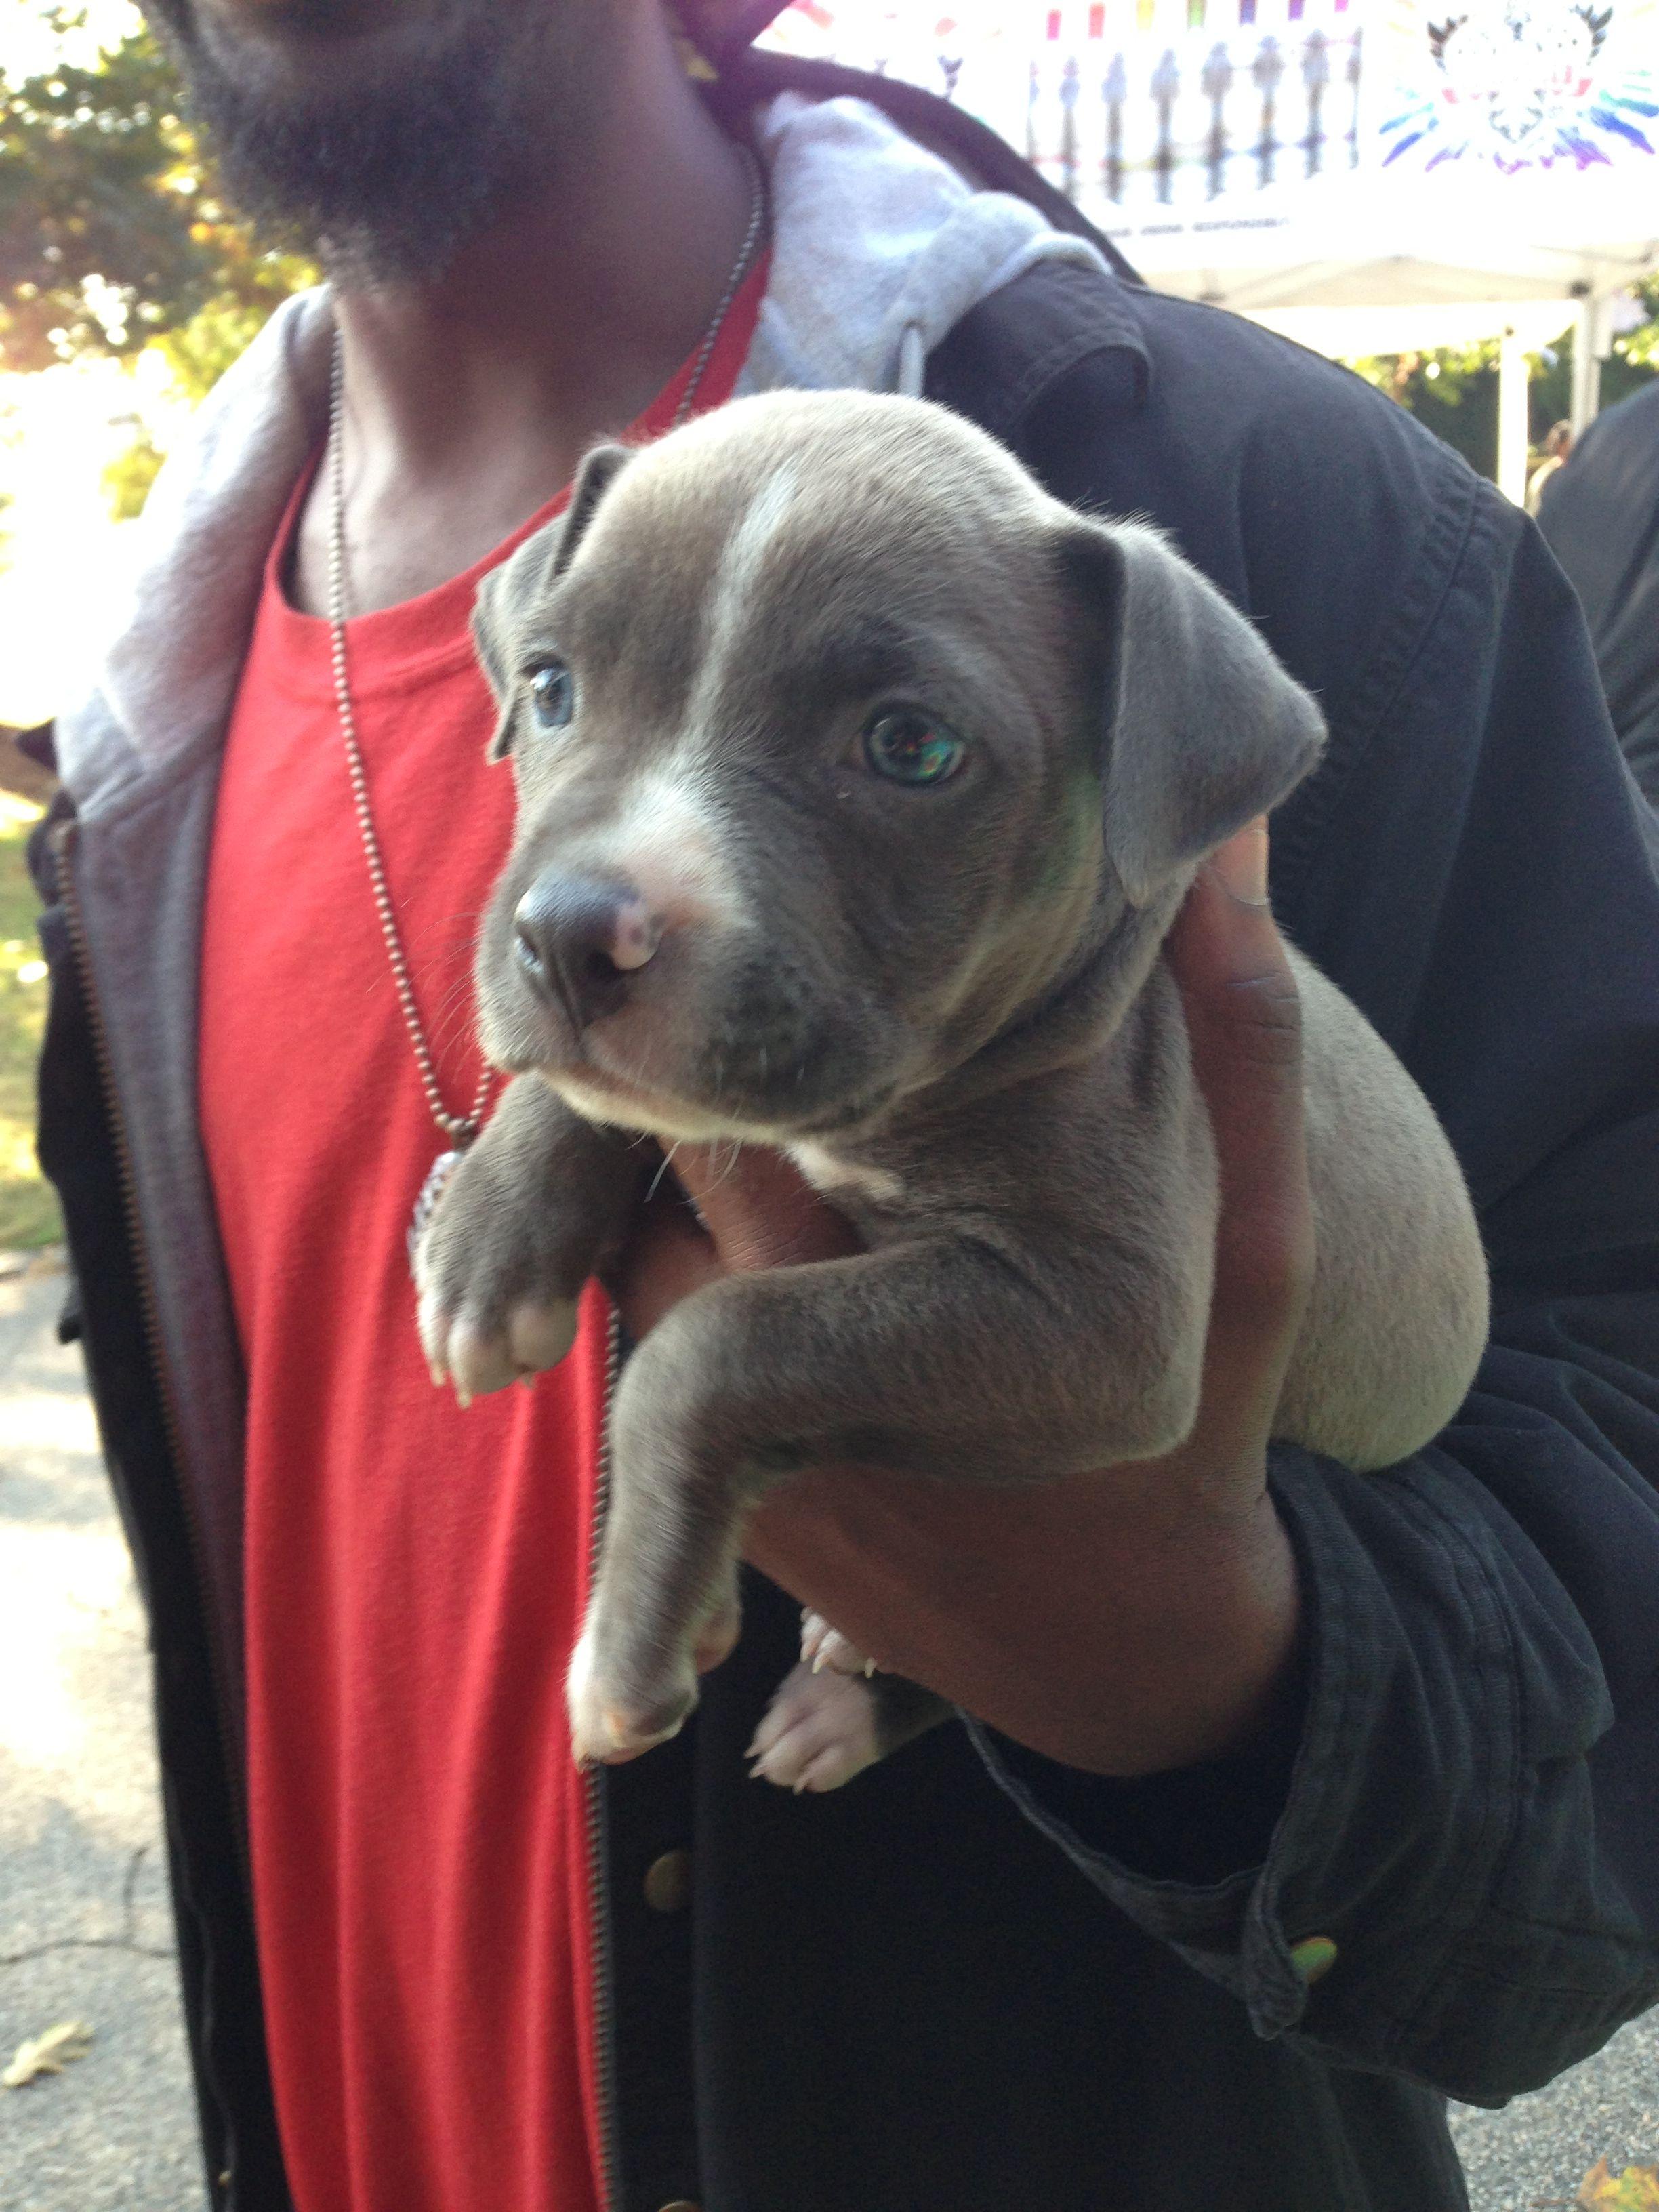 Blue pit puppy blue pit puppies pit puppies puppies